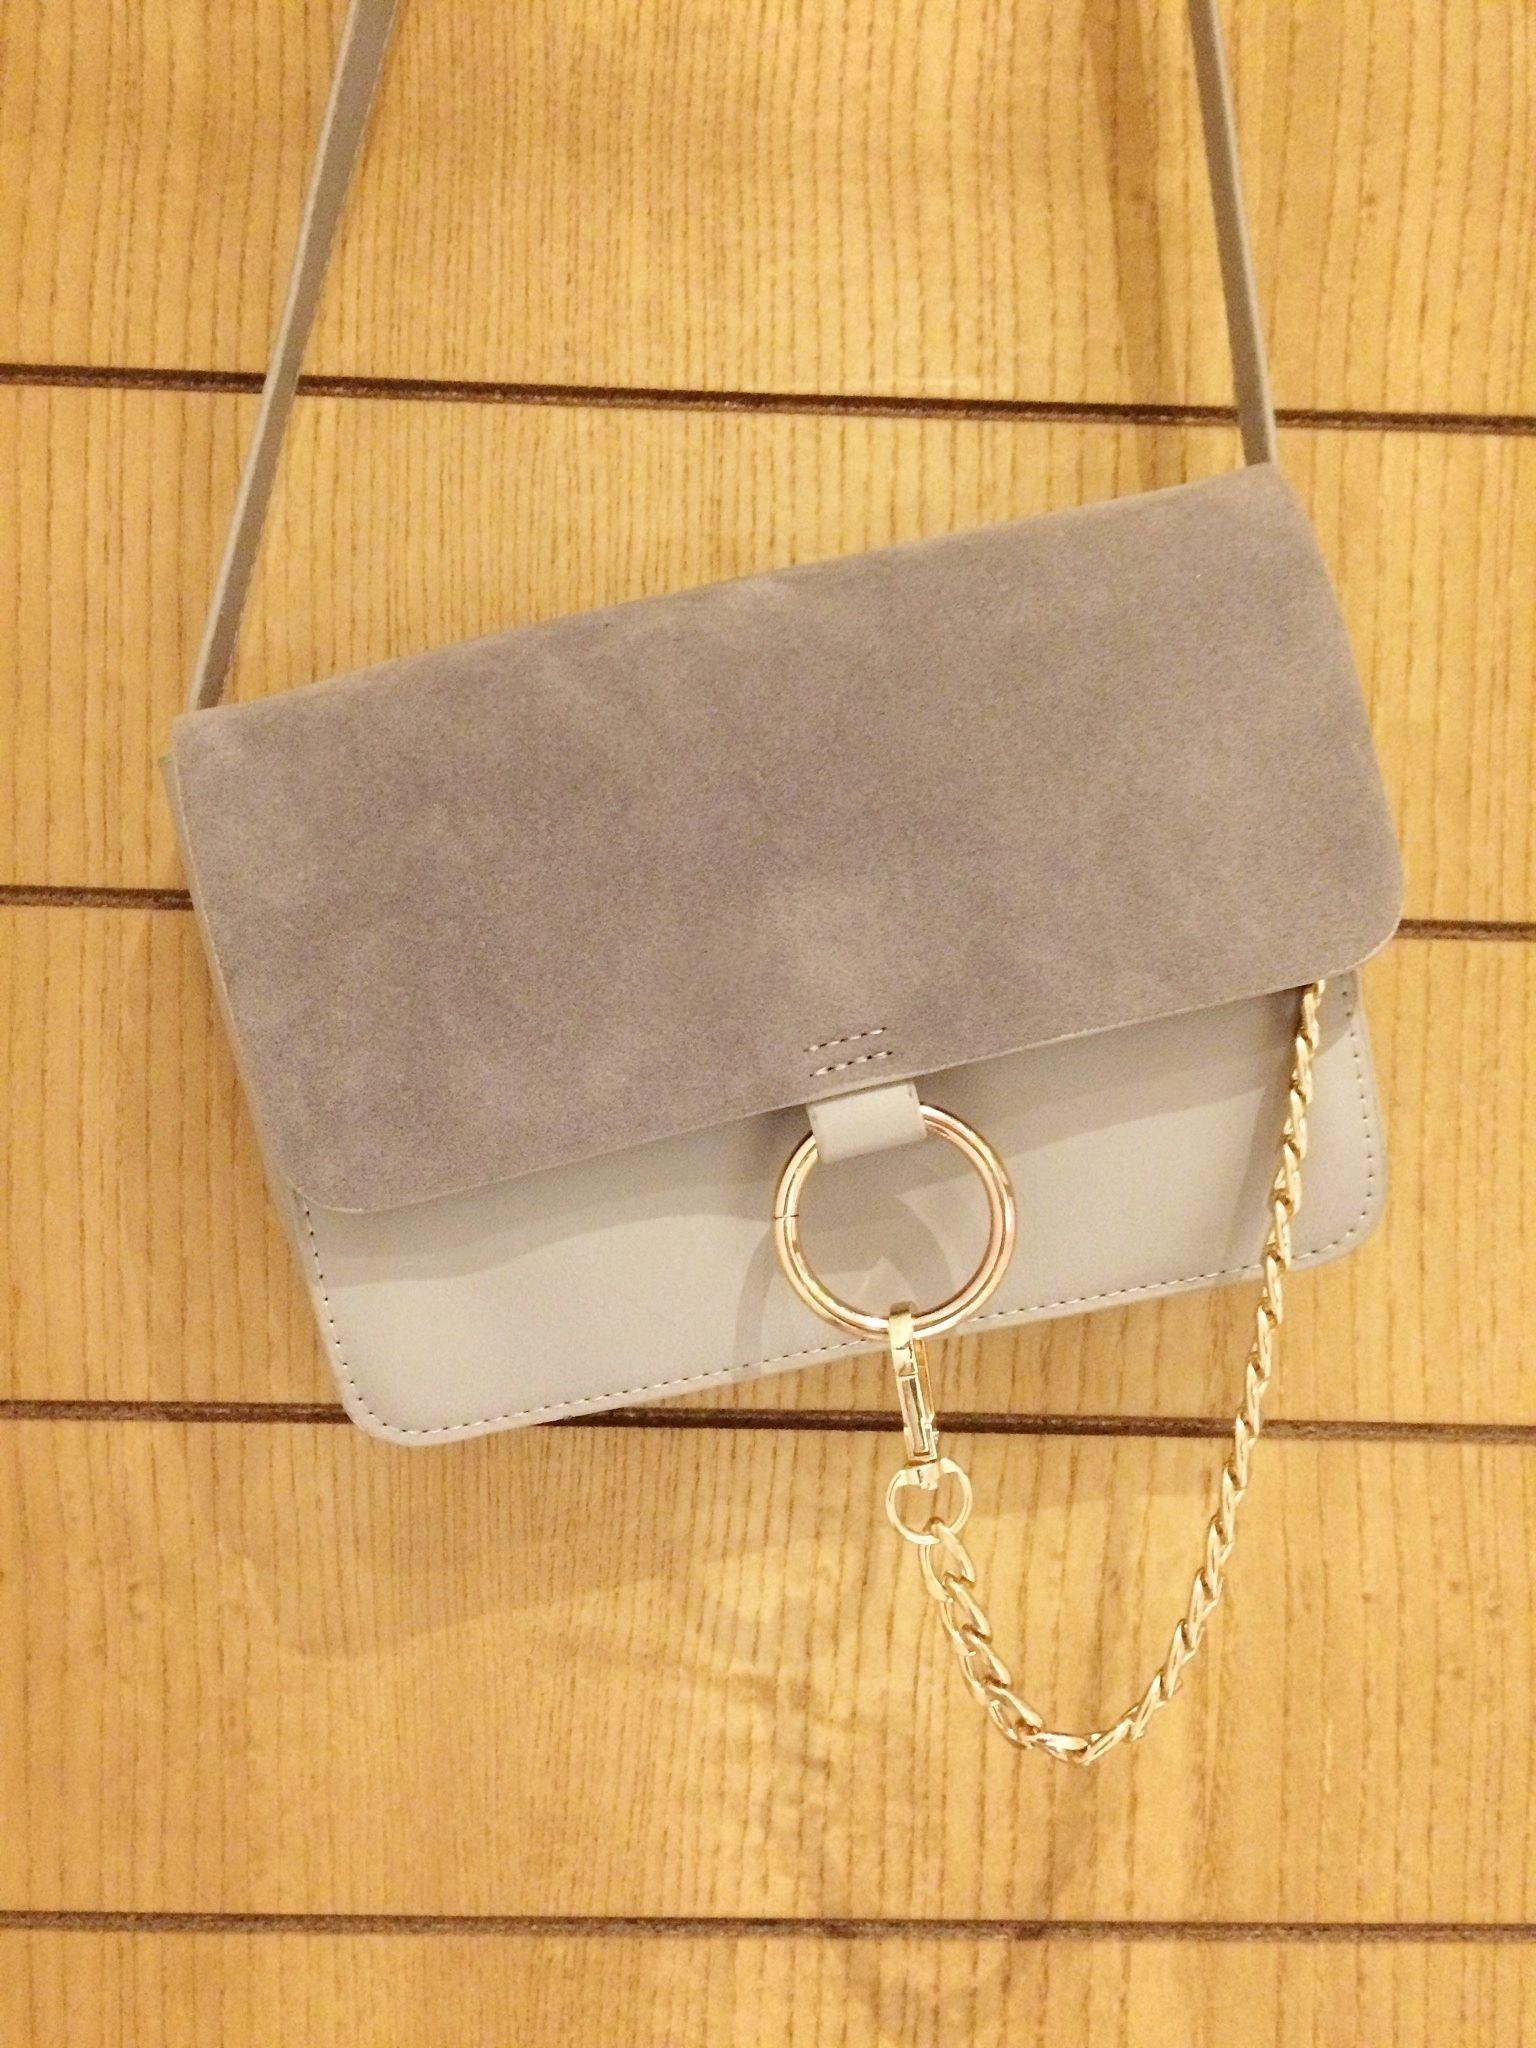 12 38 Chloe Faye Style Ring Chain Handbag Ebay Uk